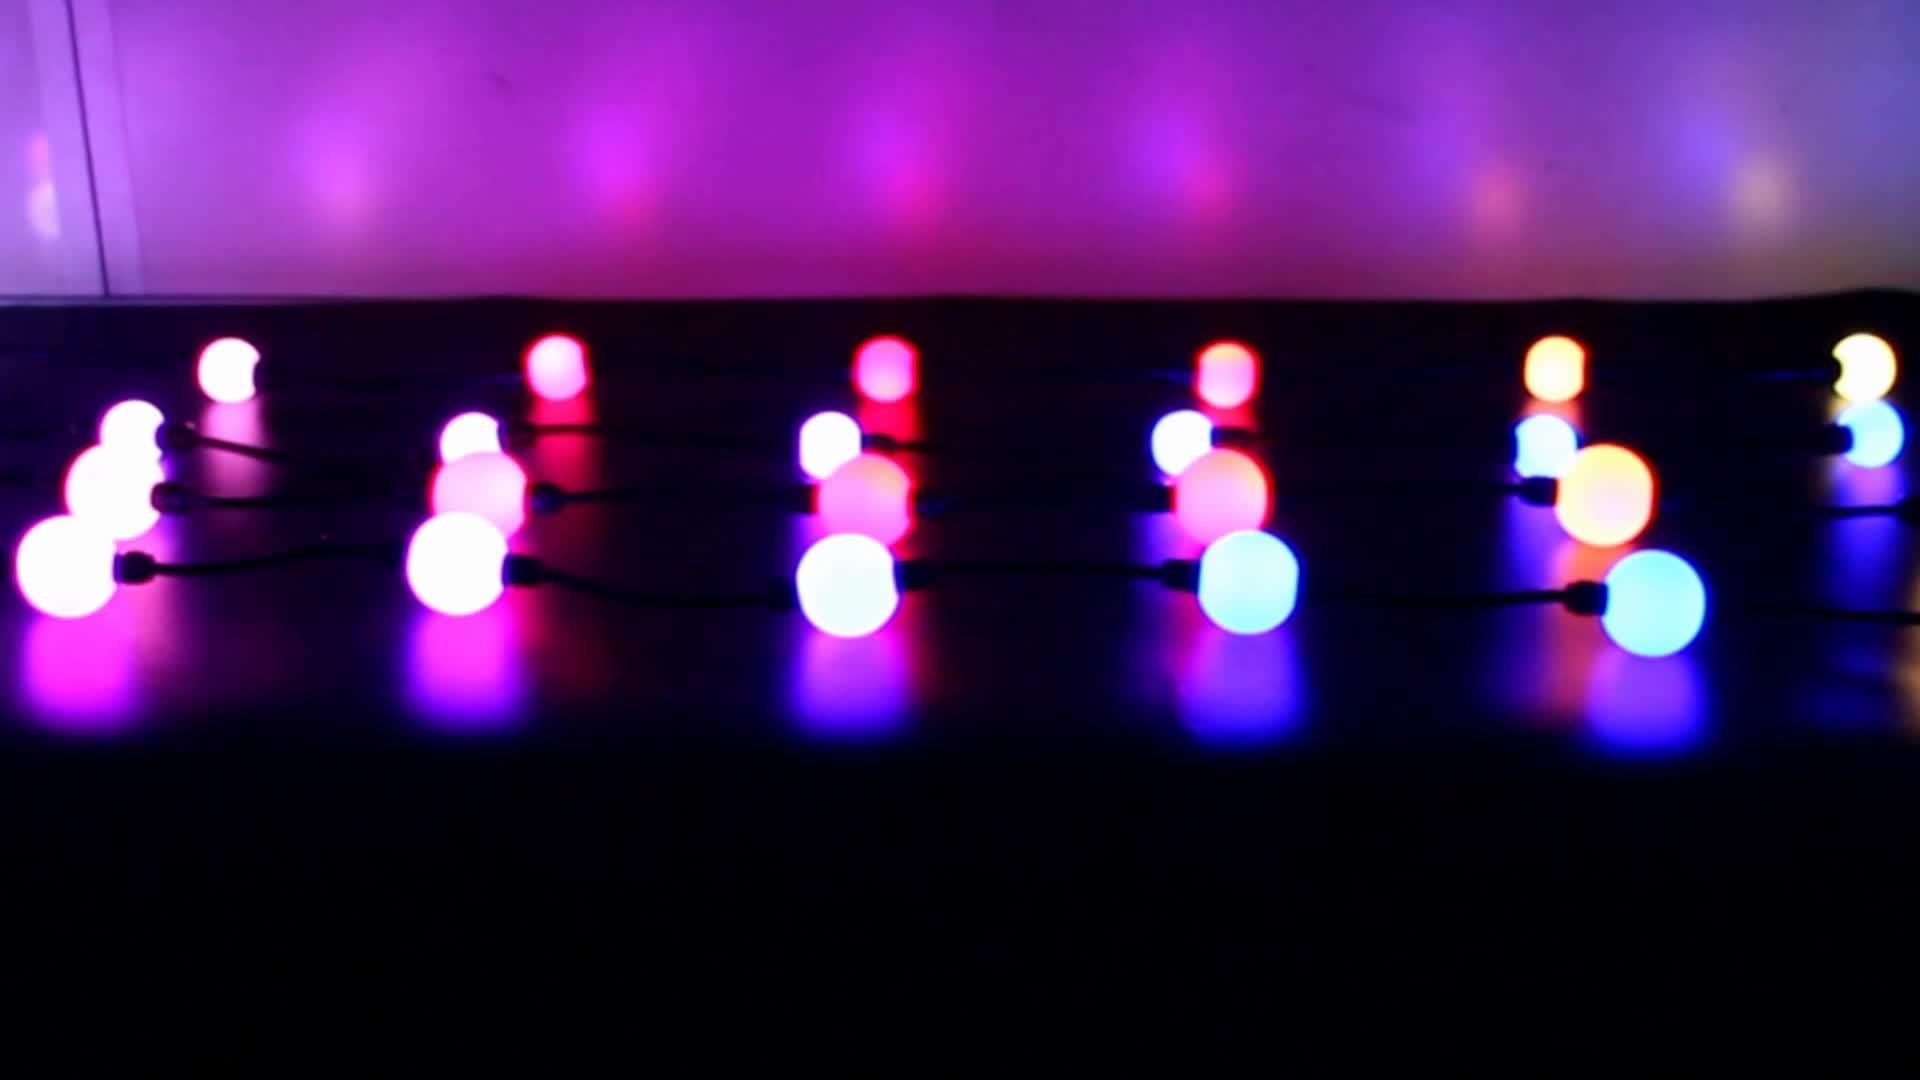 Ledเมจิกคริสตัลrgbพิกเซลลูกแสง3D dmxควบคุมledสตริงลูก